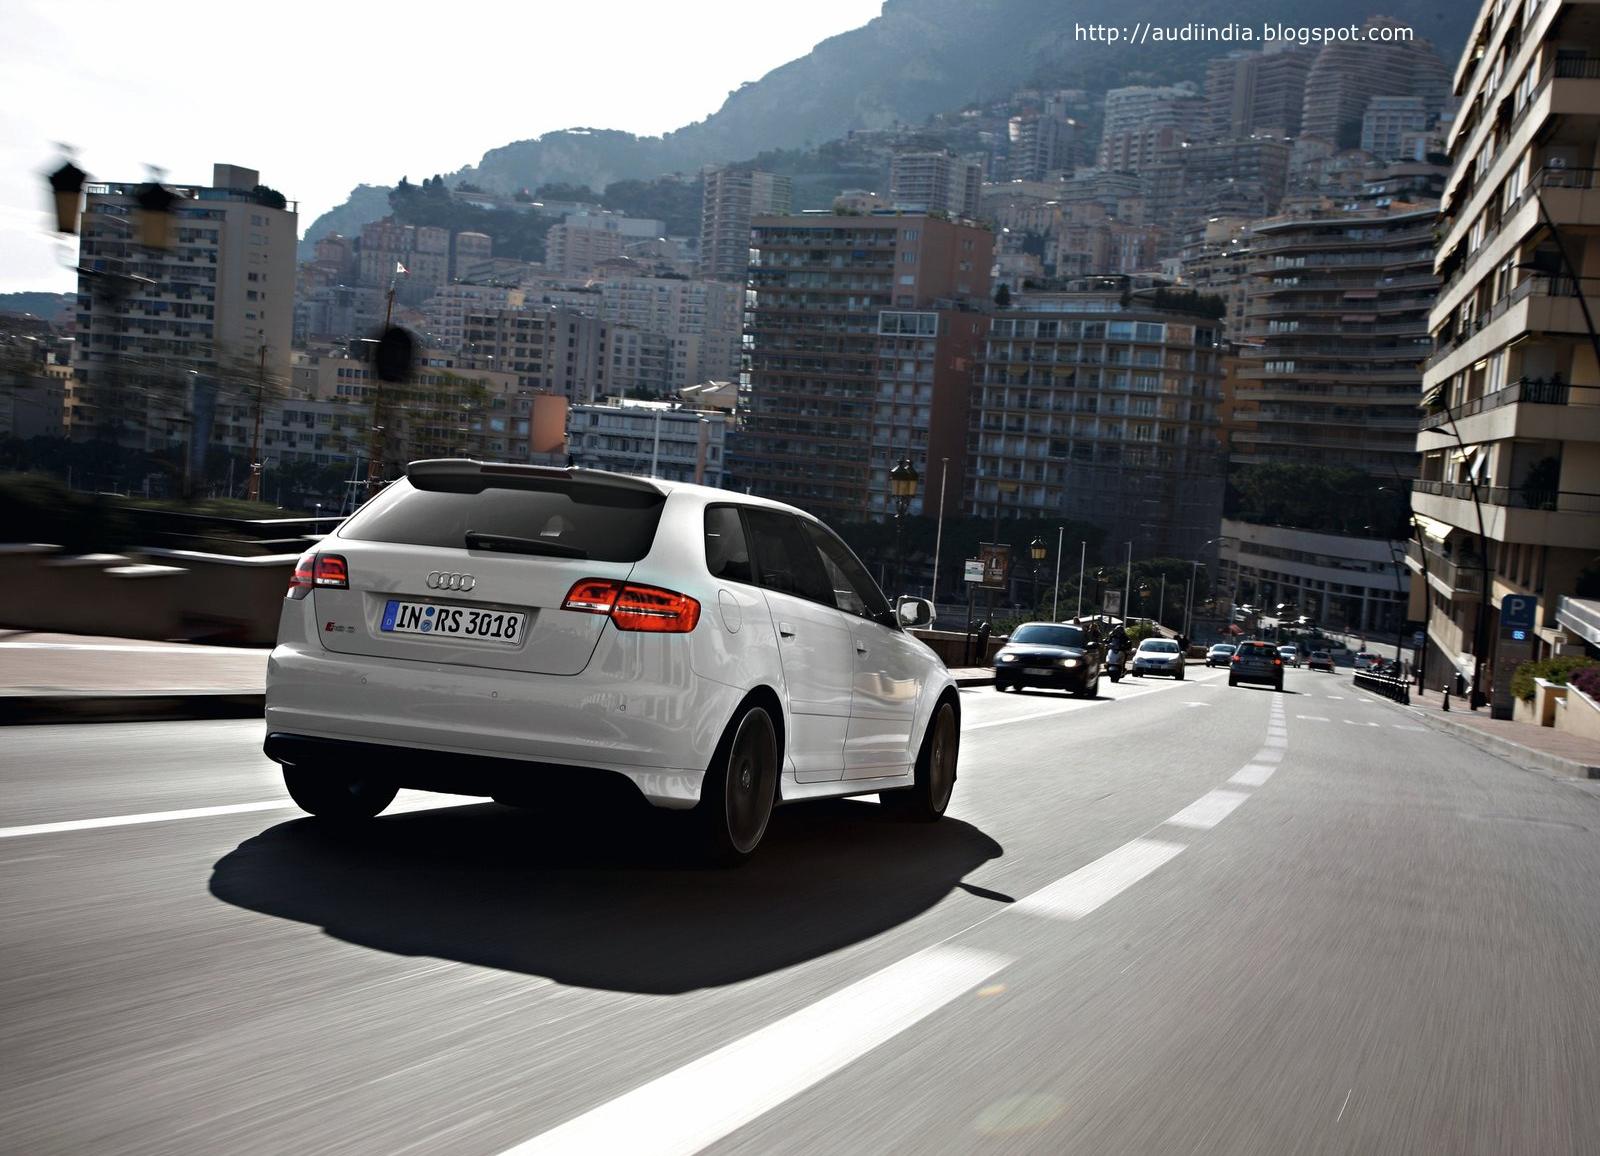 http://2.bp.blogspot.com/-rUg9uww4au4/ToquYwCzE-I/AAAAAAAABiM/sSa-XNT3x3s/s1600/Audi-RS3_Sportback_2012_1600x1200_wallpaper_1a+copy.jpg